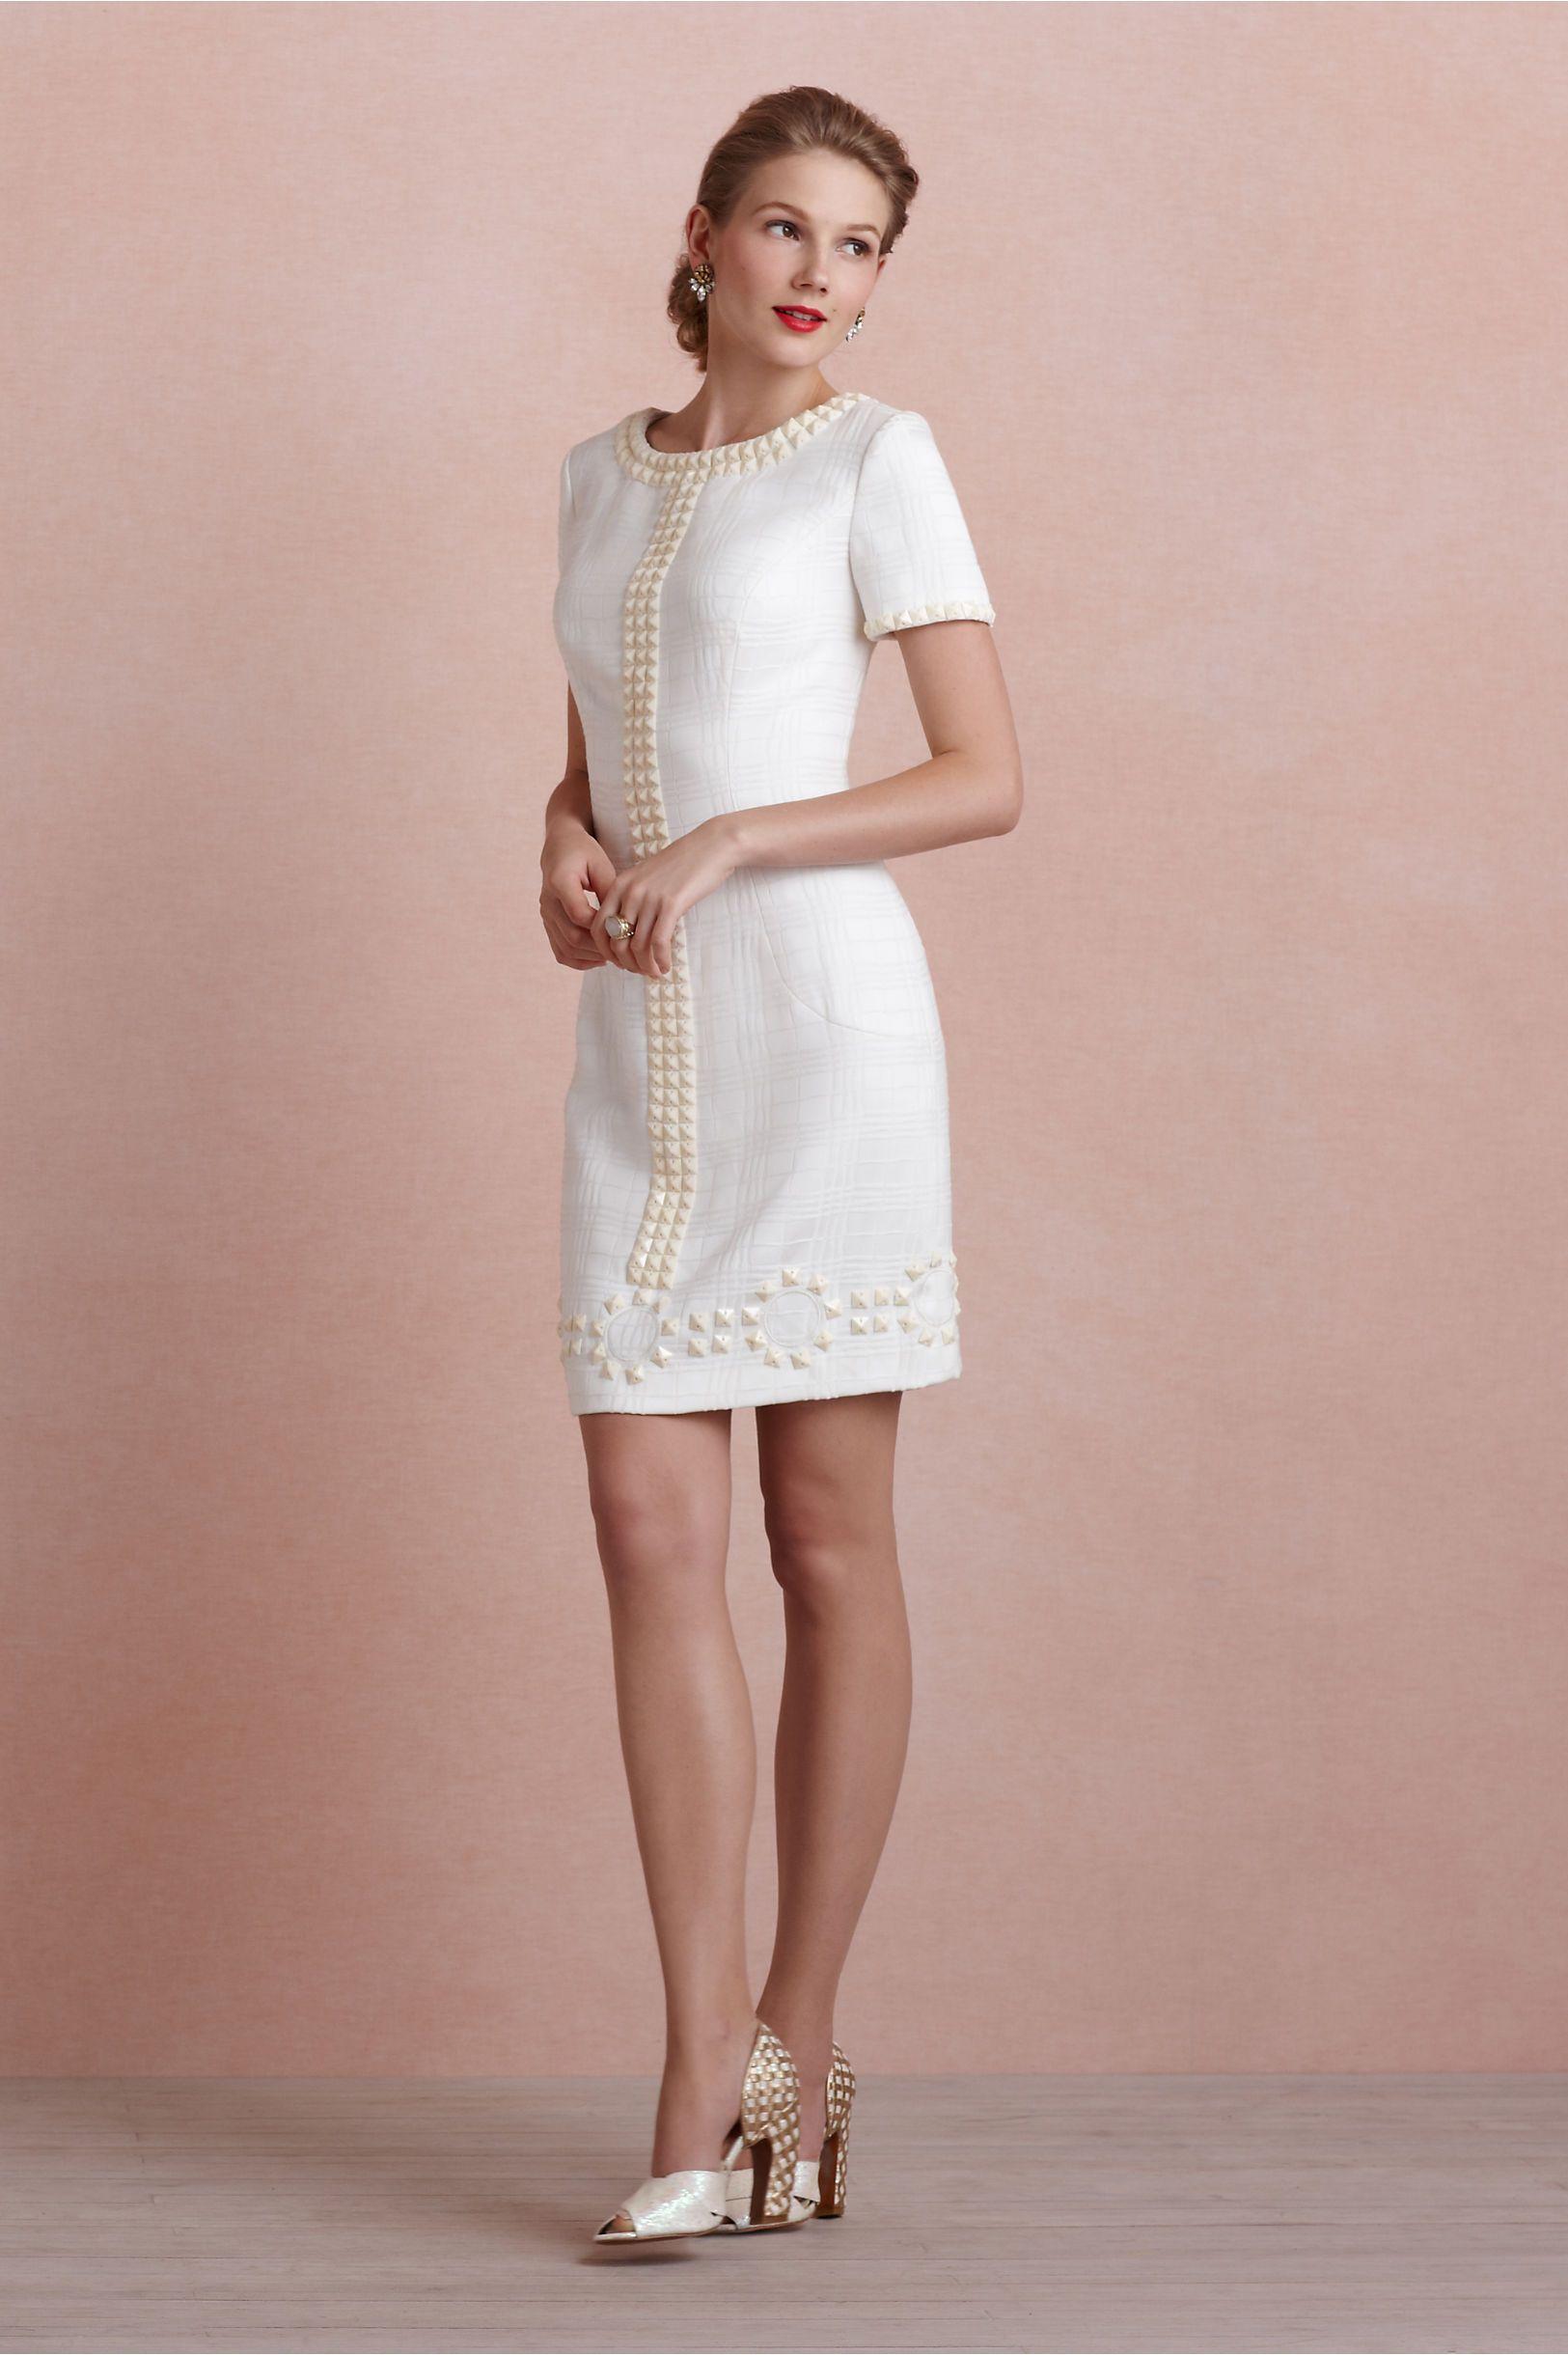 Pin de Julie C en ∞ Fancy Dress | Pinterest | Vestiditos